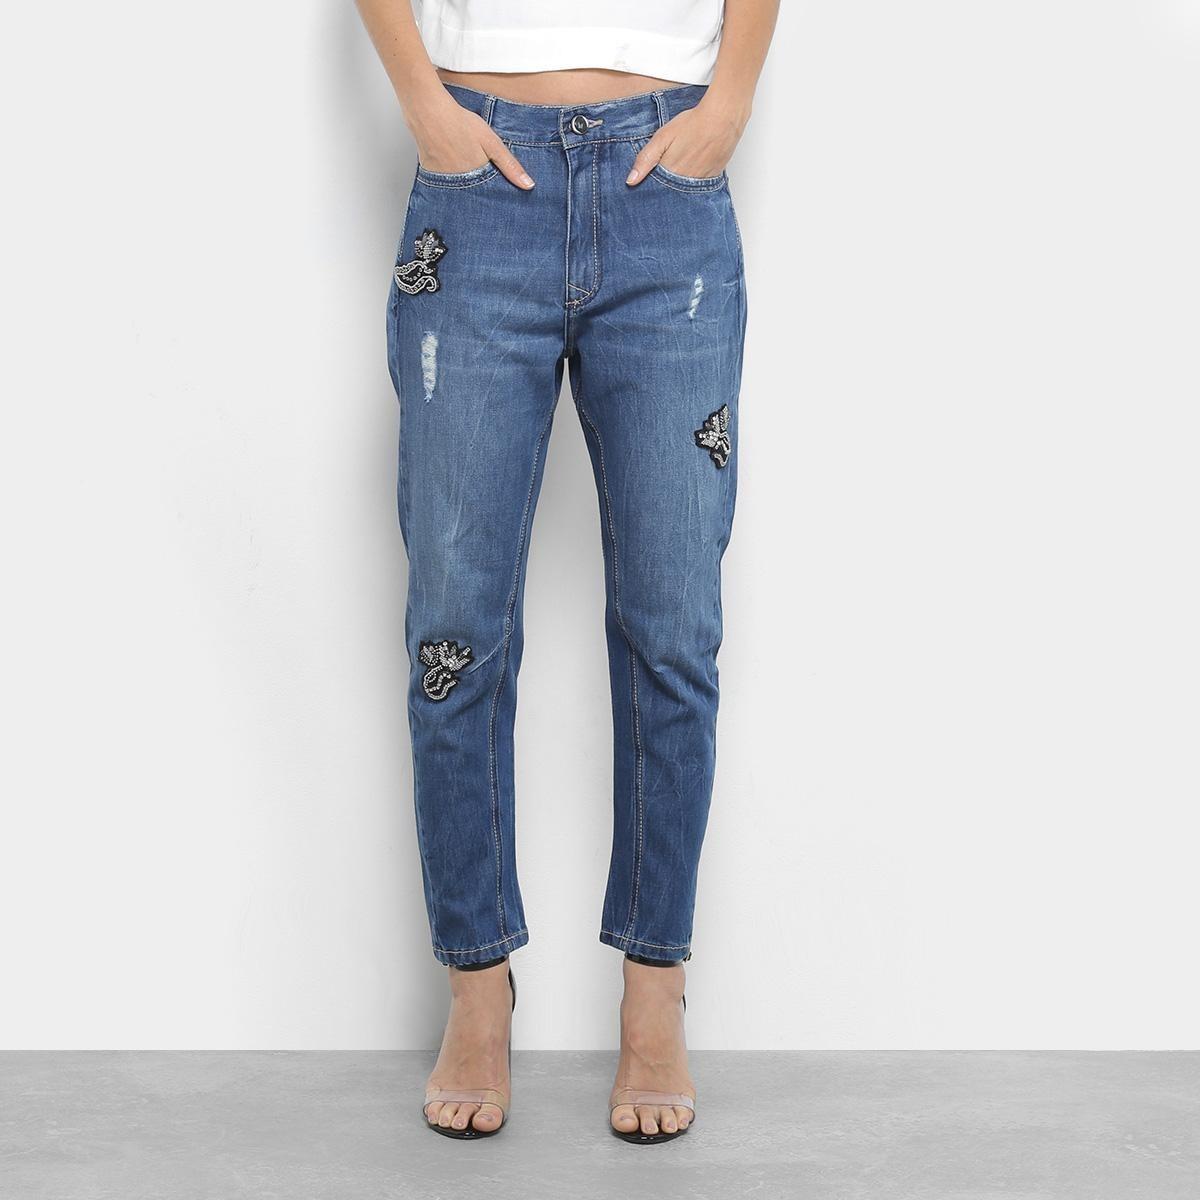 2ddfebc16 calça jeans boyfriend maria filó com patch cintura alta. Carregando zoom.